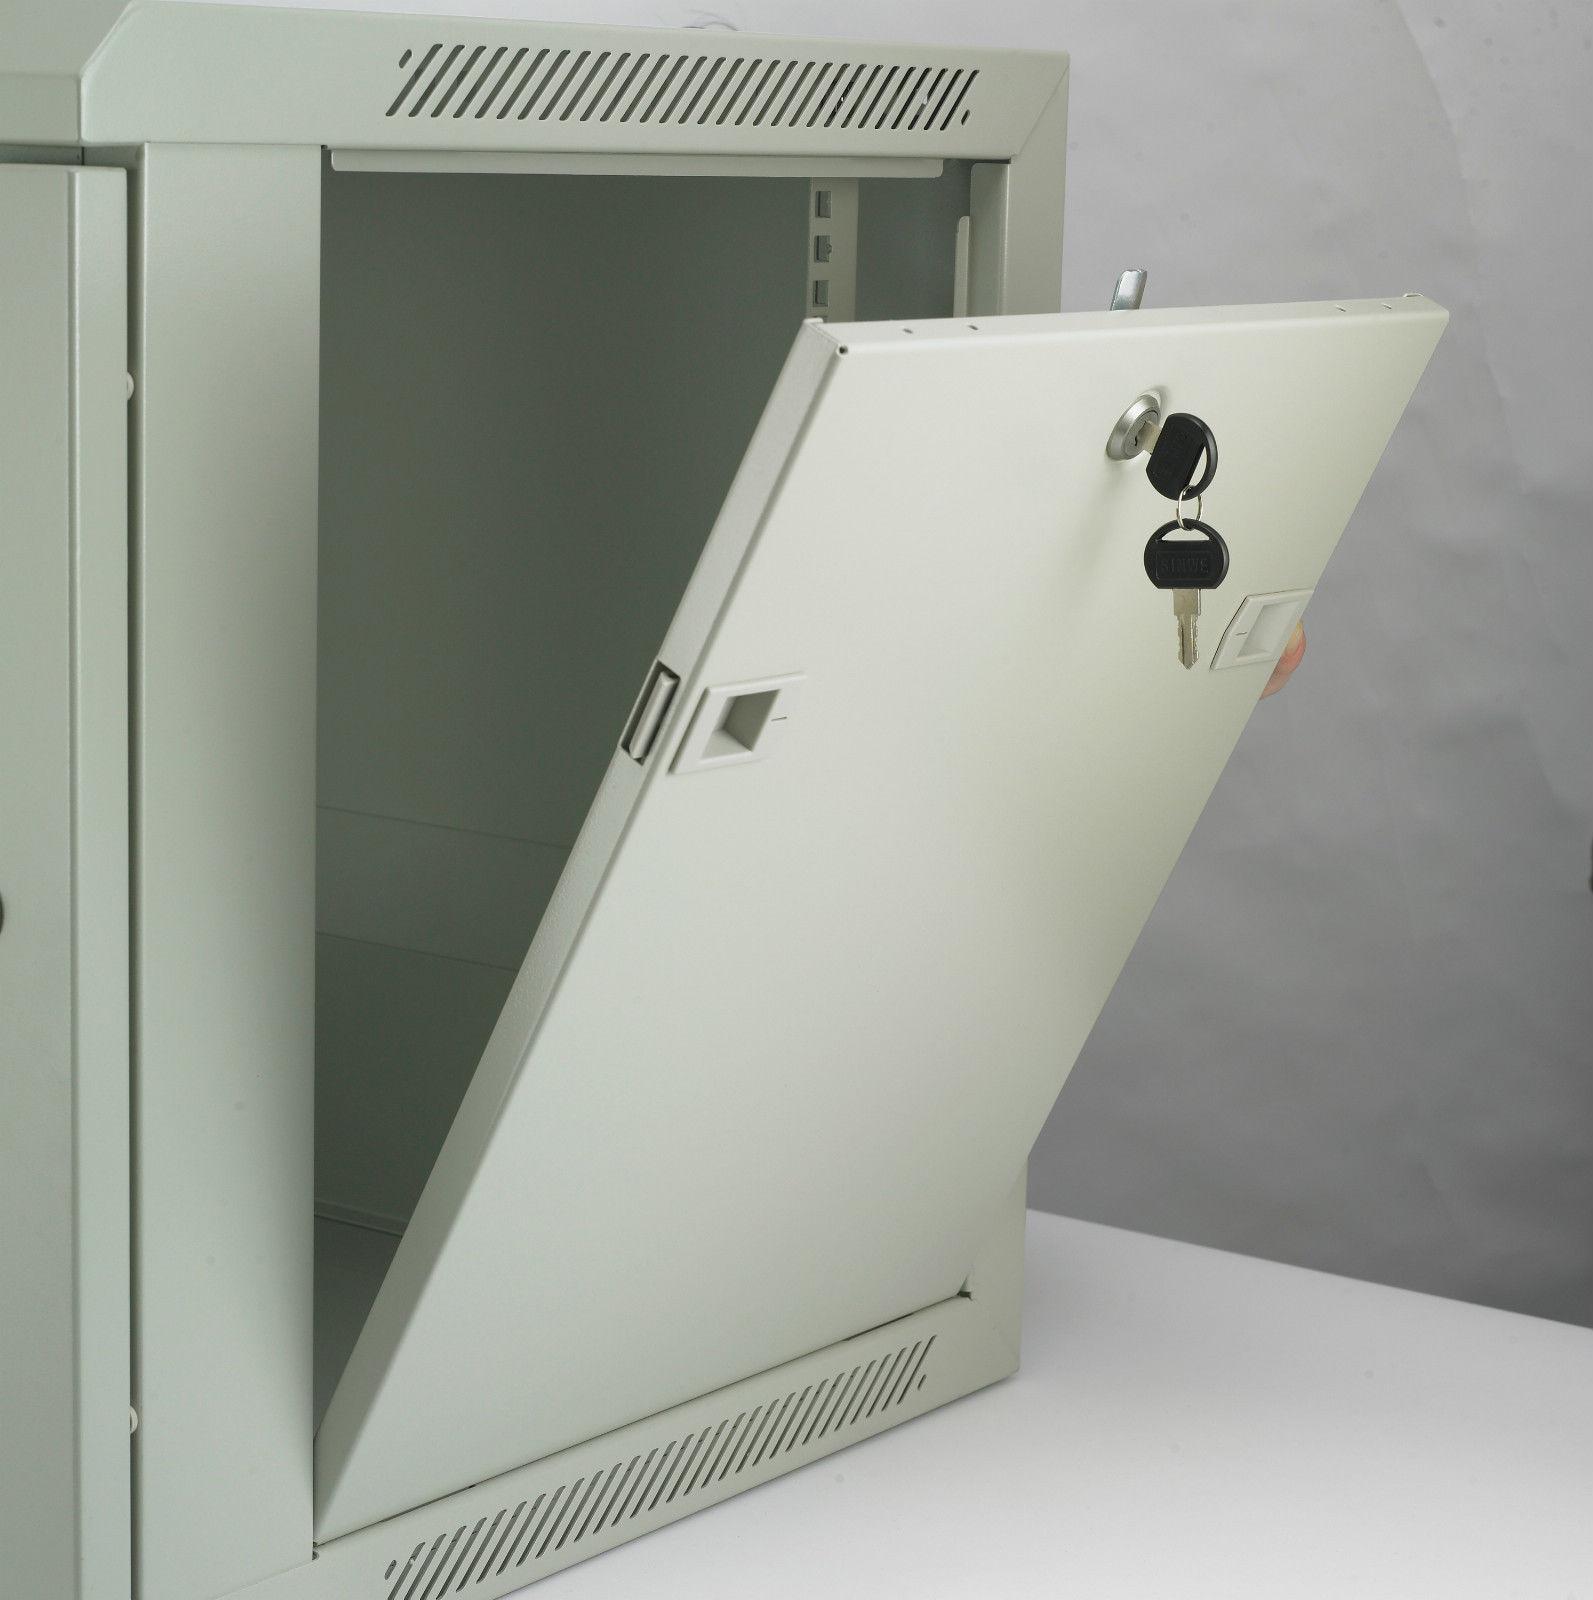 18u 19 500mm Deep Network Wall Mounted Data Cabinet Patch Panel Pdu Ebay